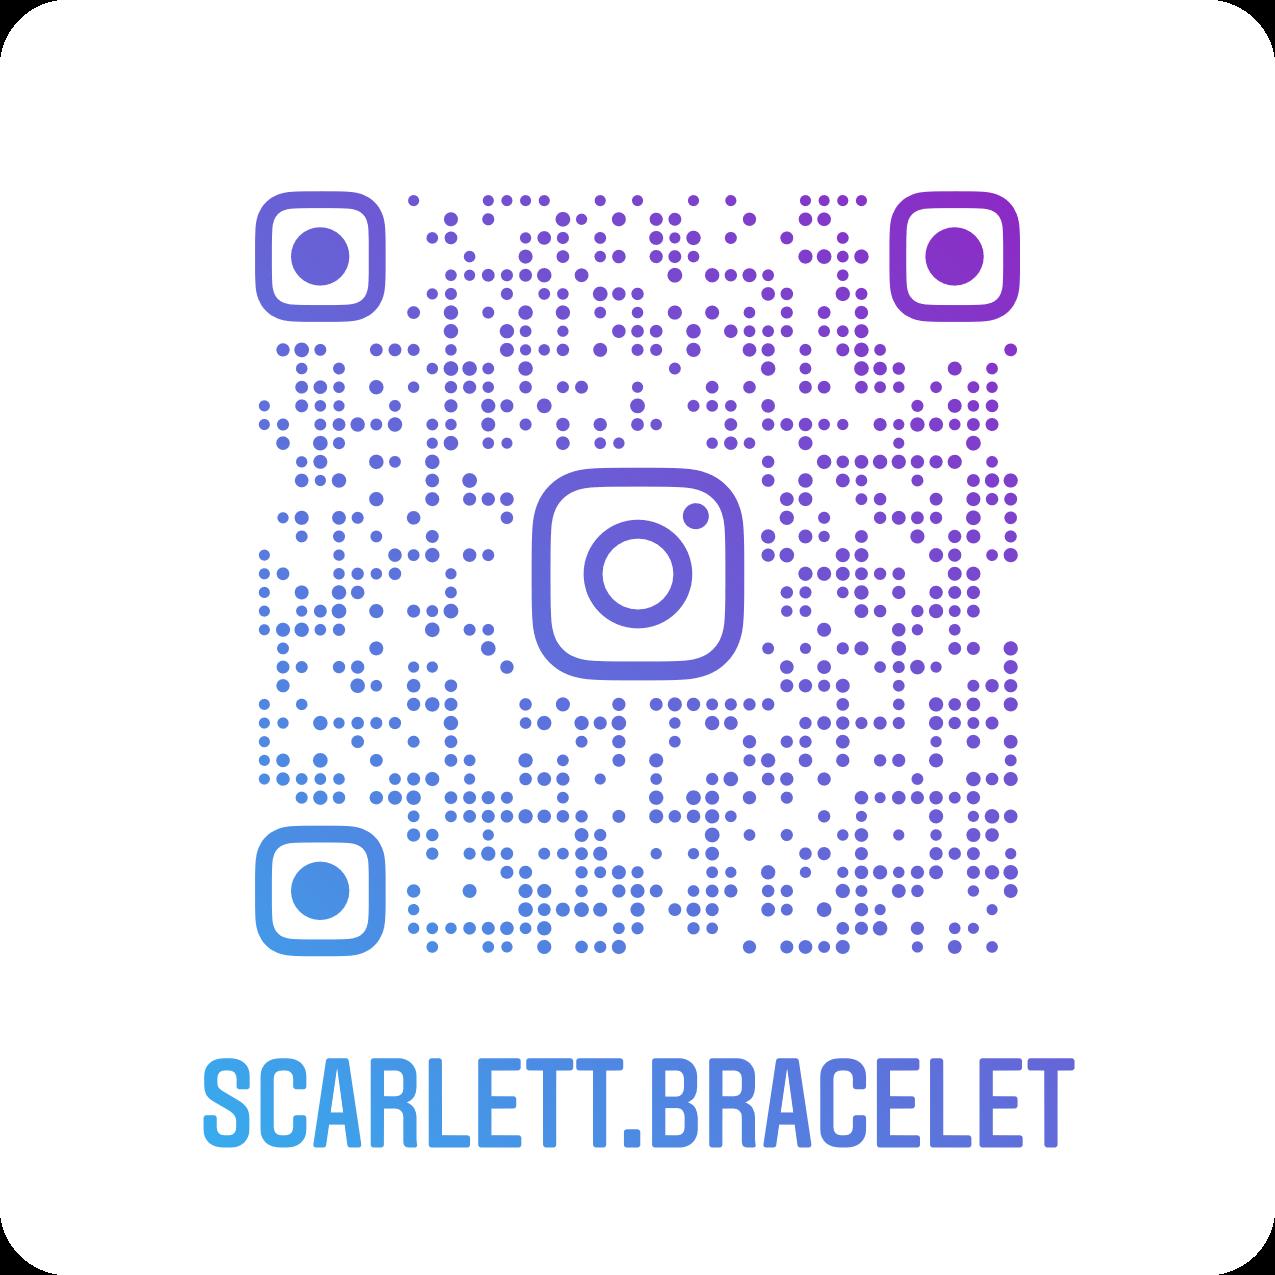 QR Code Scarlett Bracelet sur Instagram